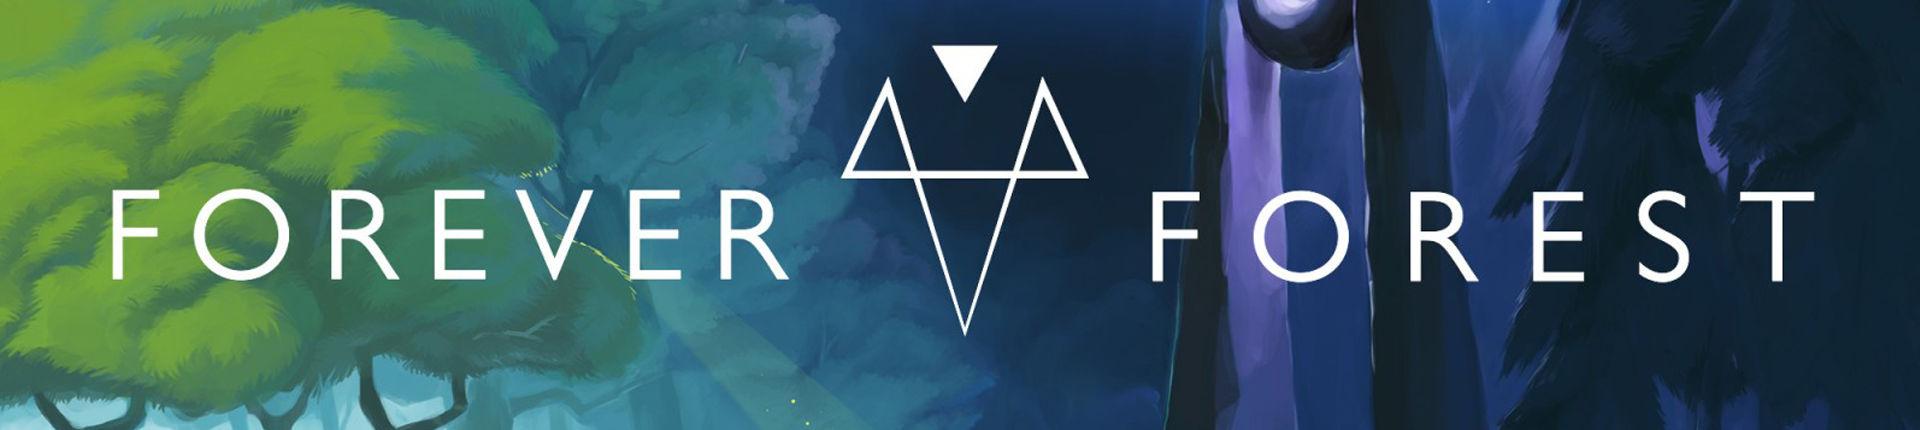 <a href='https://www.mightygamesmag.de/all-game-list/forever-forest/'>Zum Spiel</a>